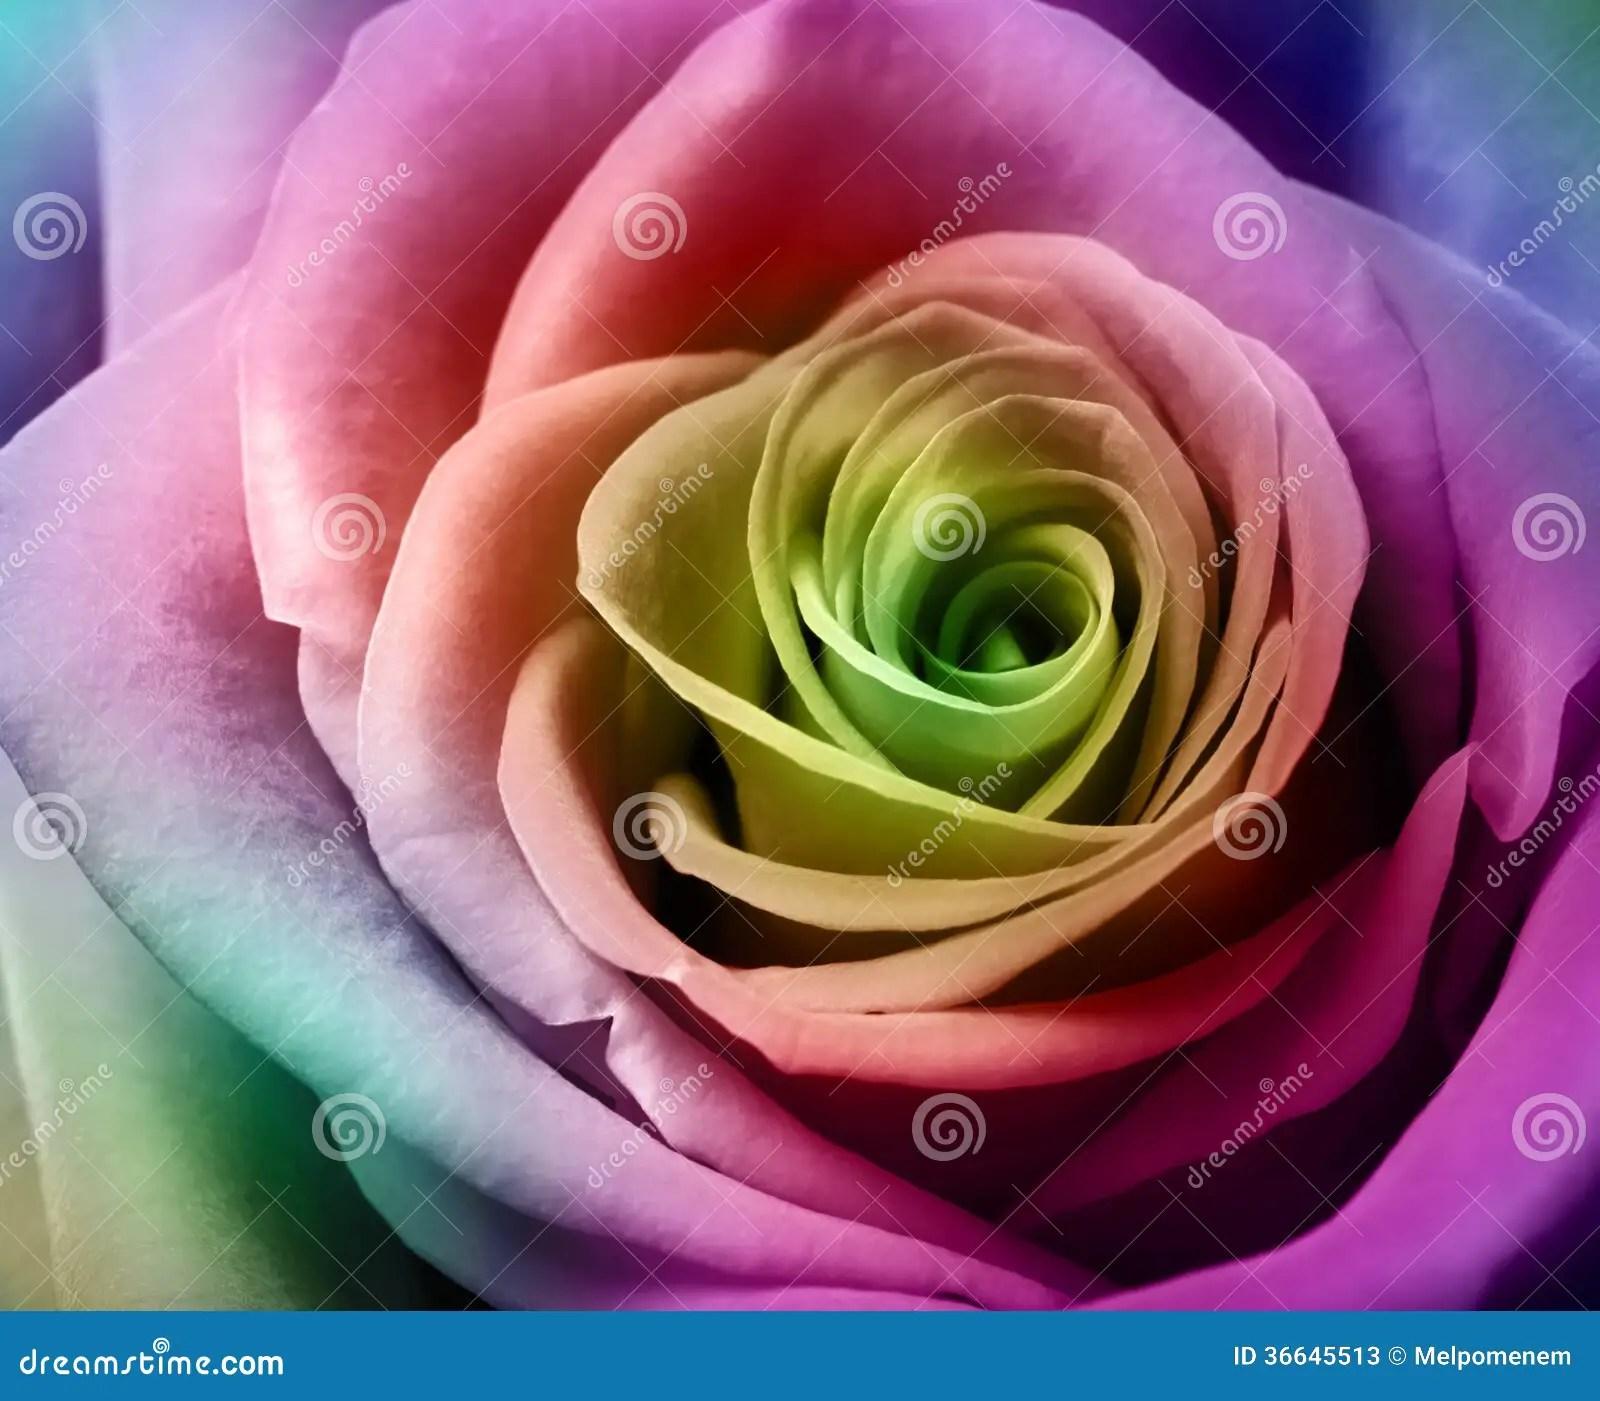 Schne Bunte Rose Stockfotos  Bild 36645513